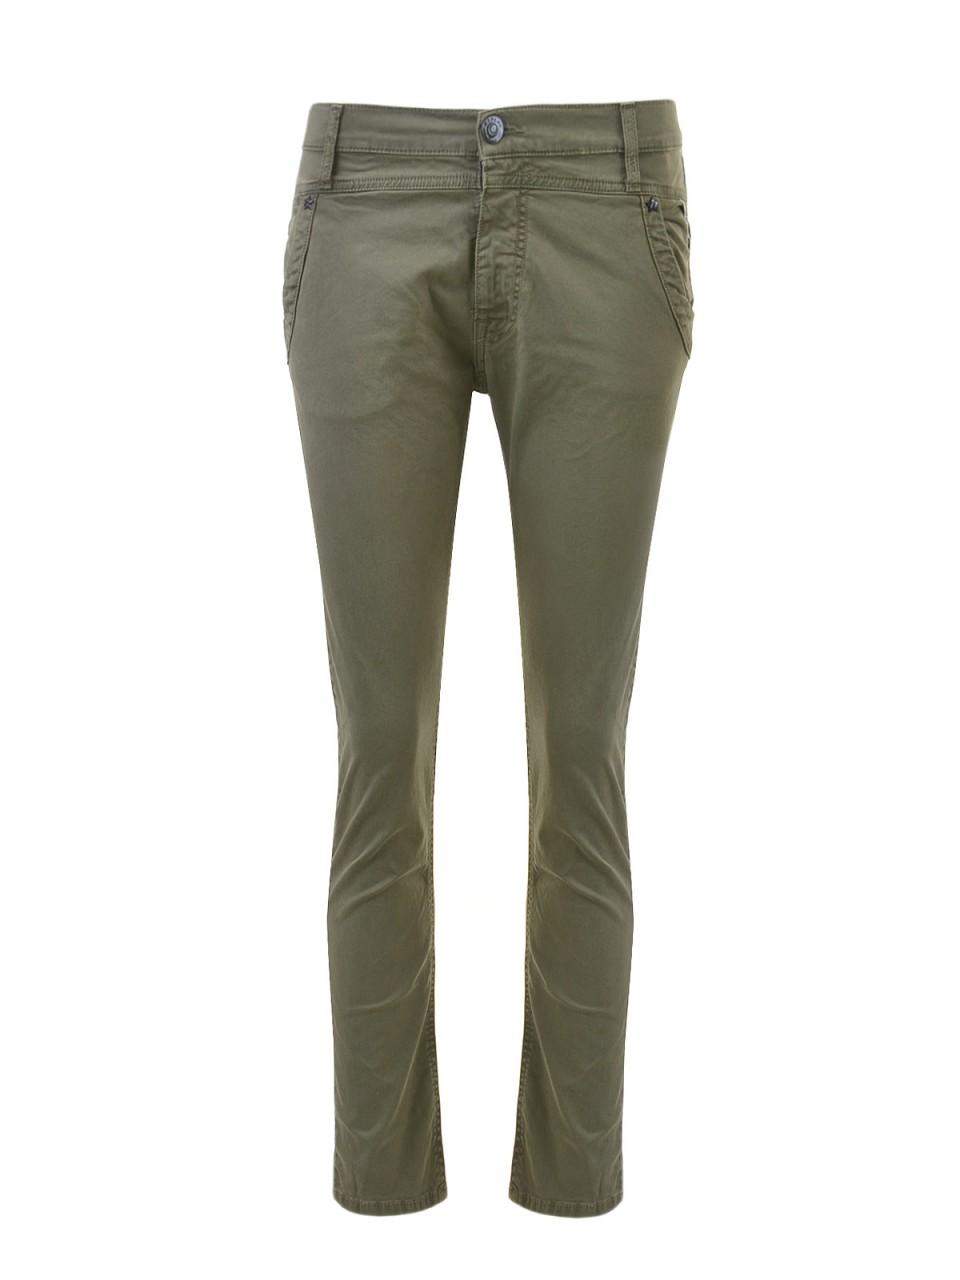 replay-damen-jeans-oliv